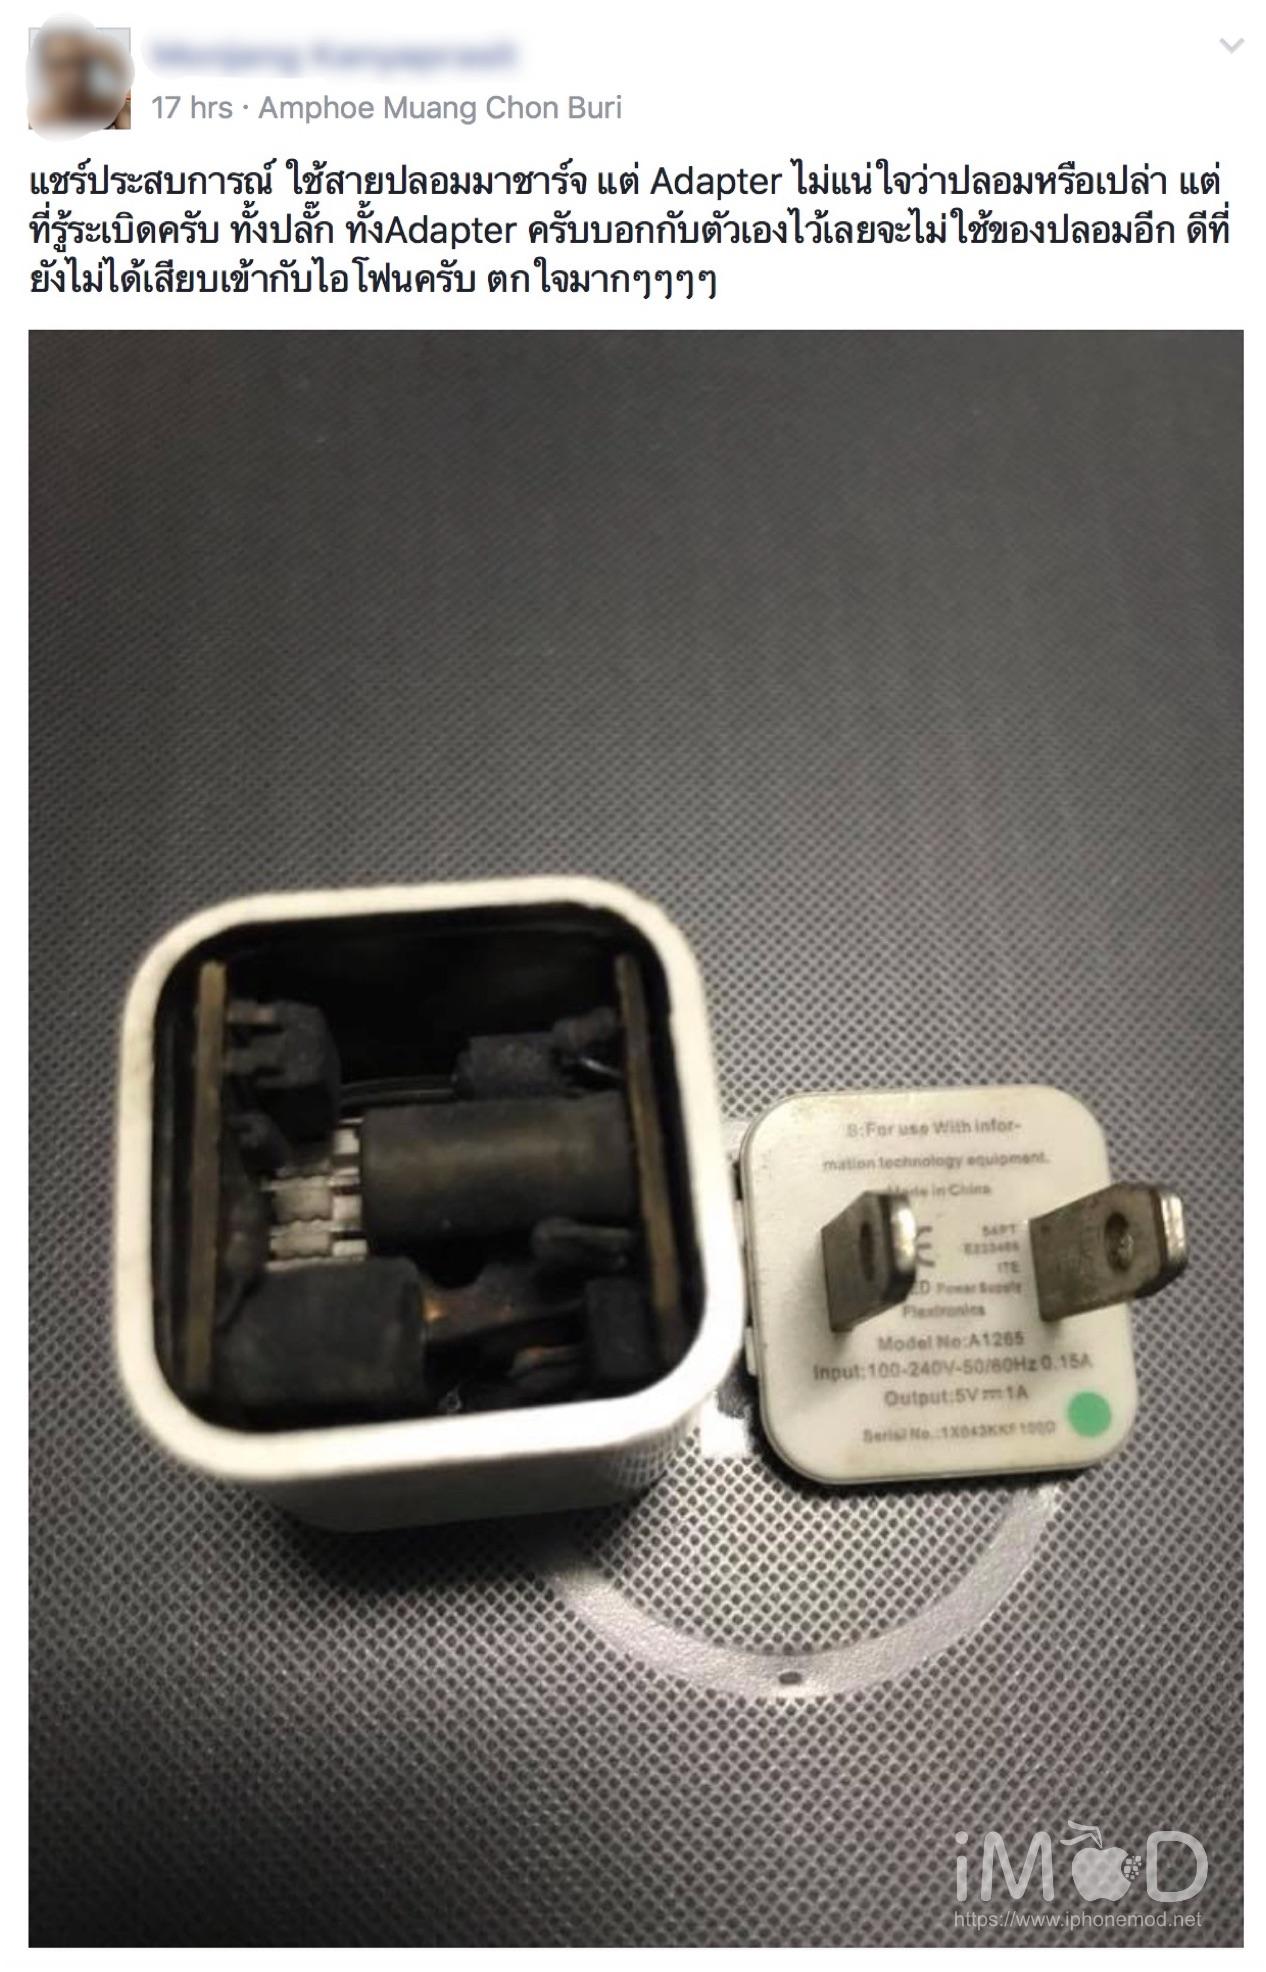 Apple Adapter ของปลอม 4